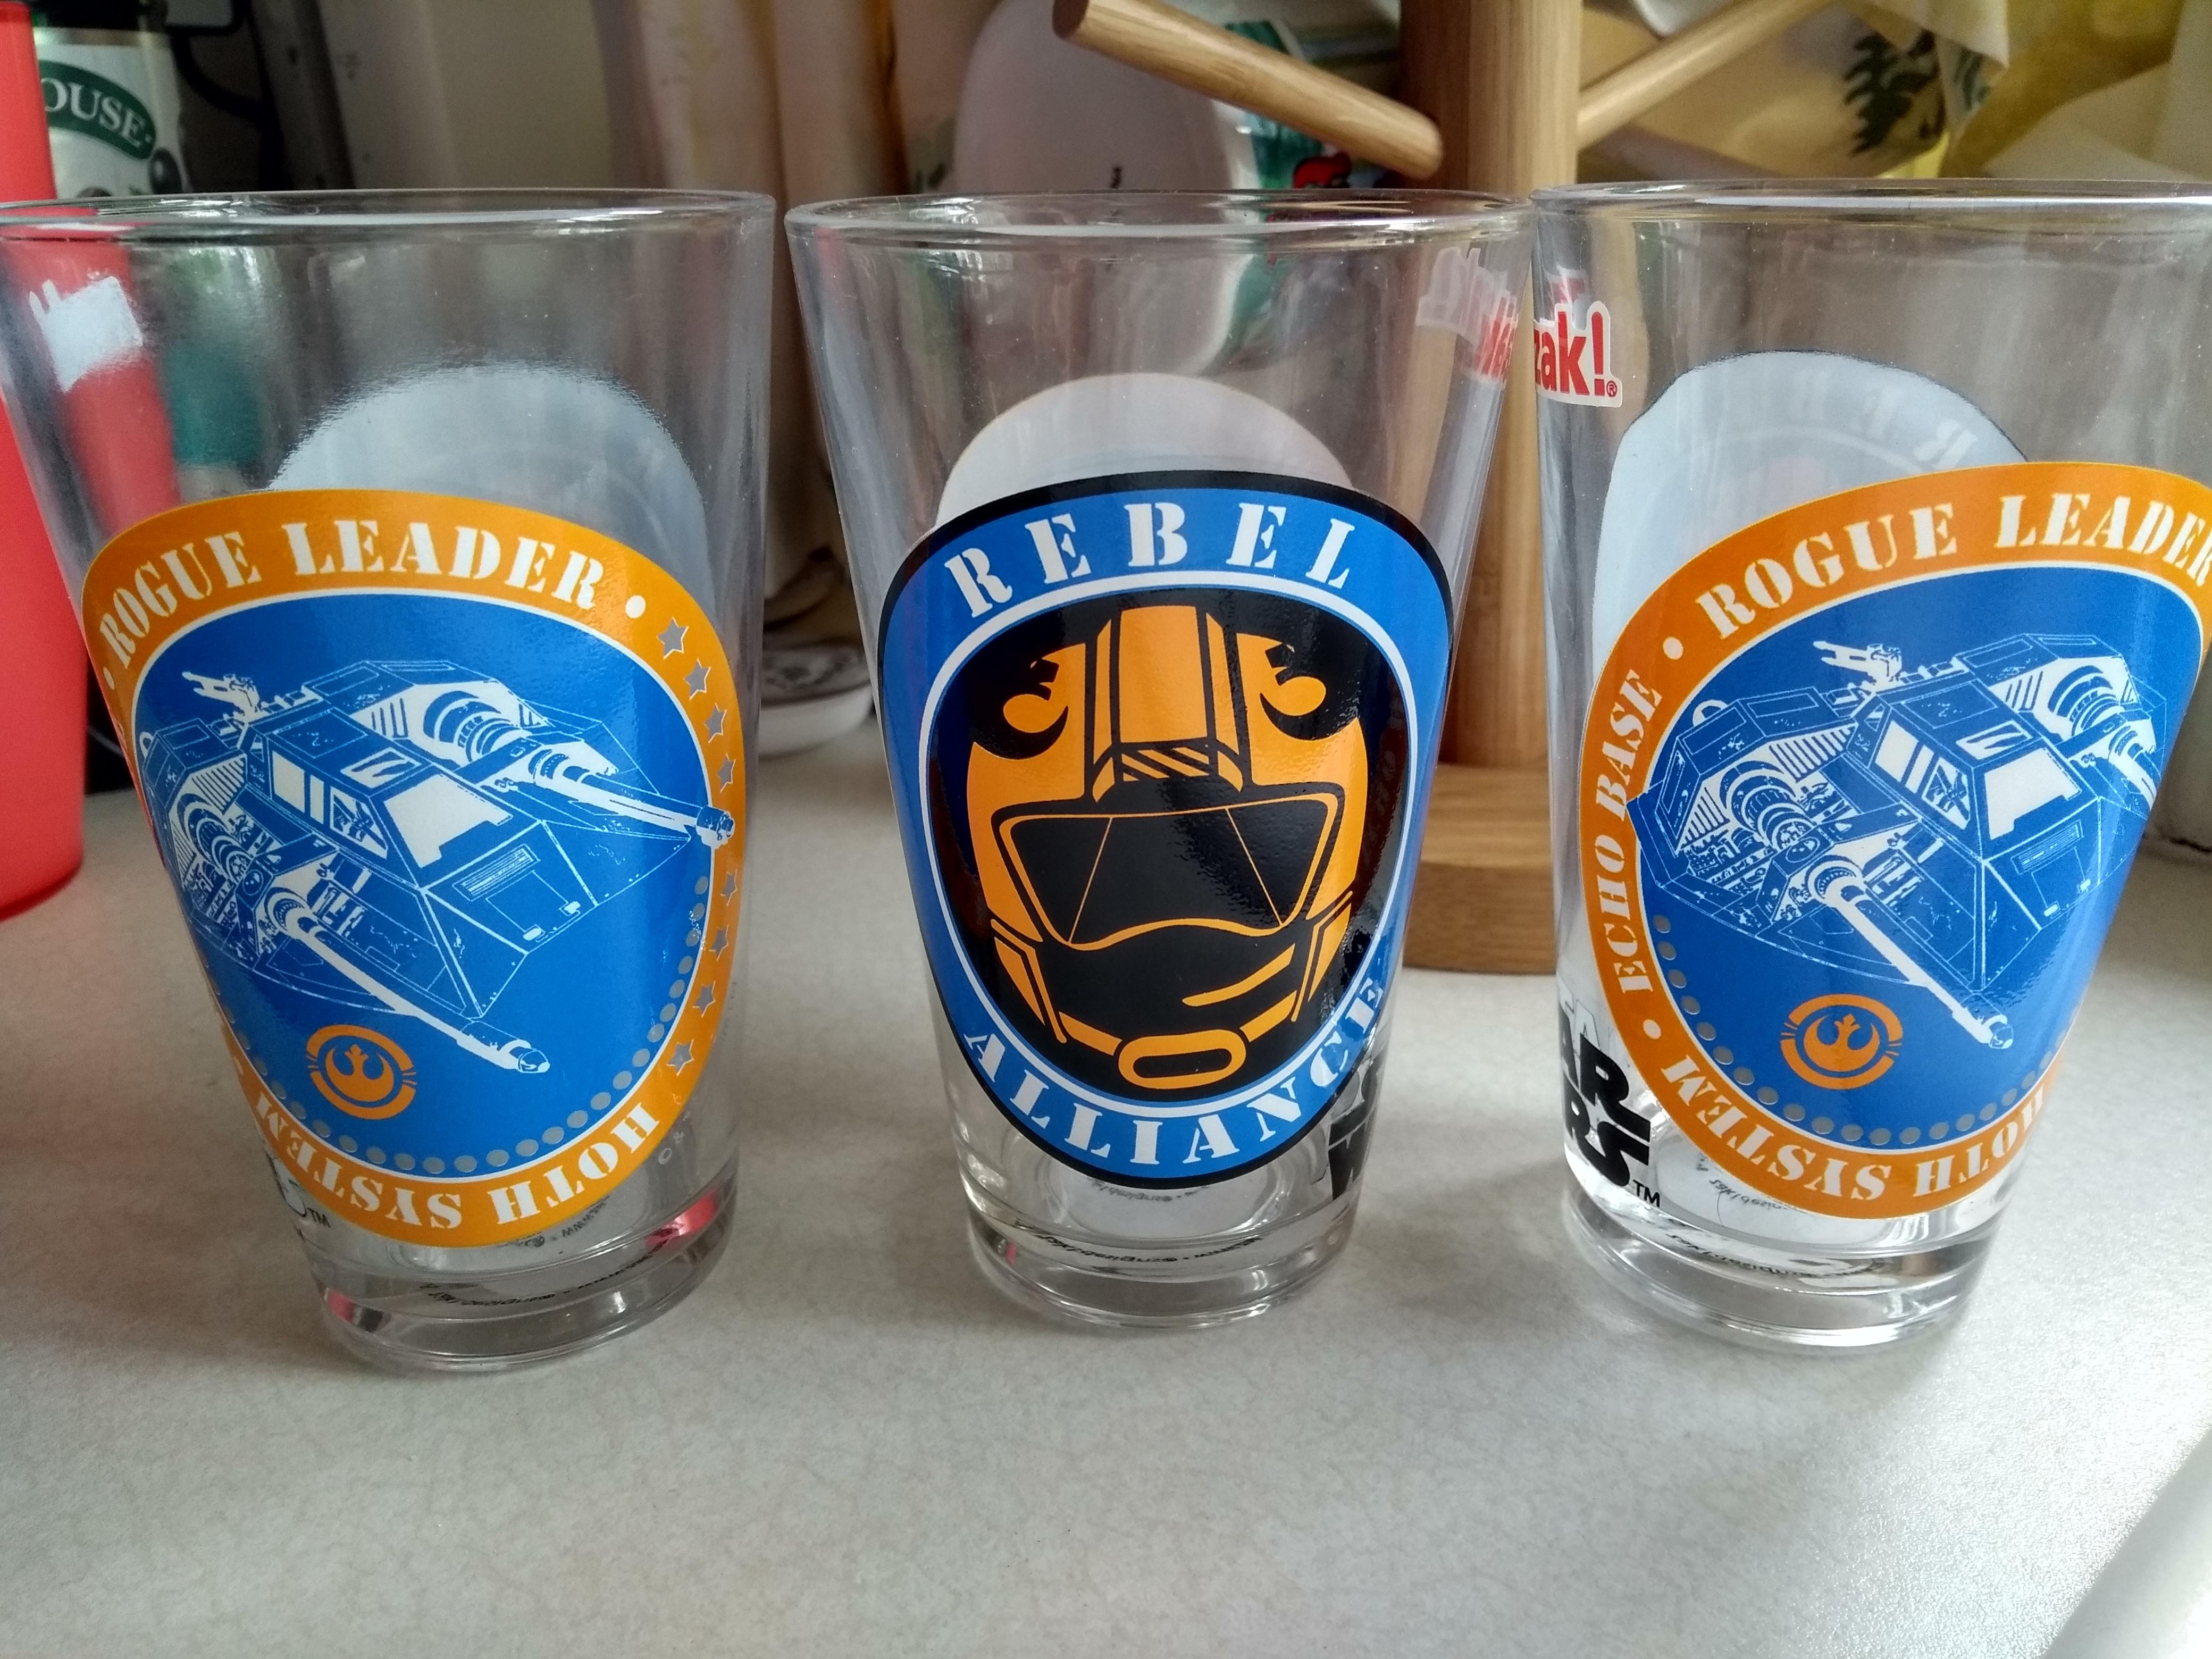 3 Star Wars Glasses for £1 @ Home Bargains